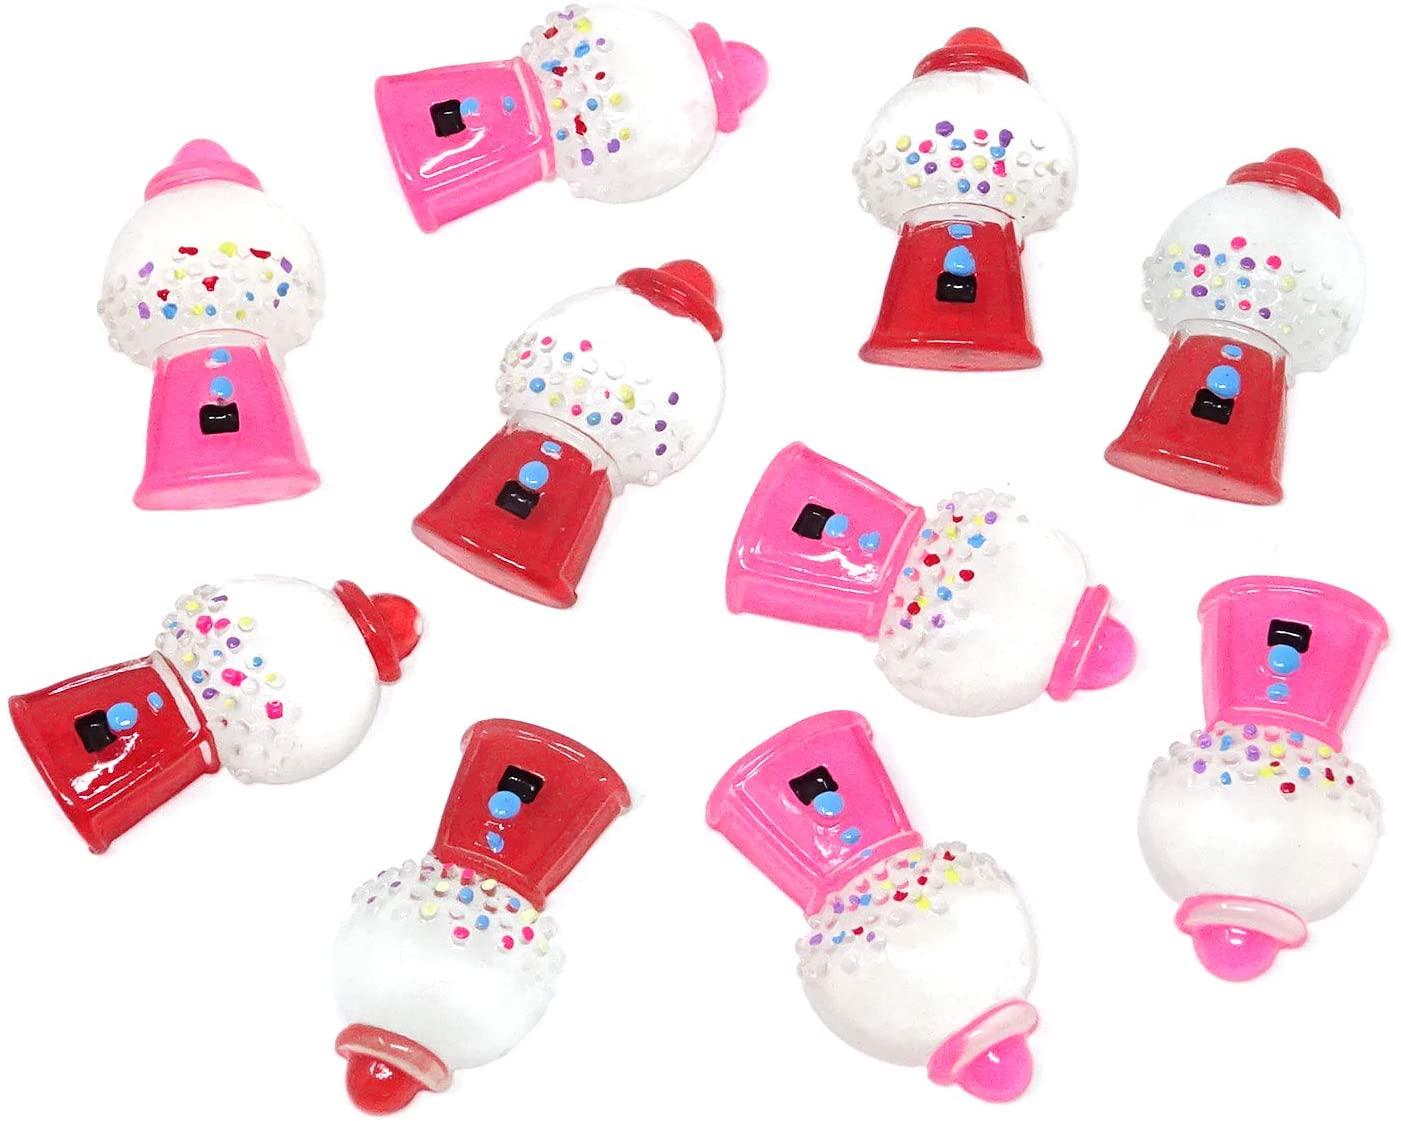 Honbay 10PCS Bubble Gum Machine Flatback Resin Beads for DIY Crafts